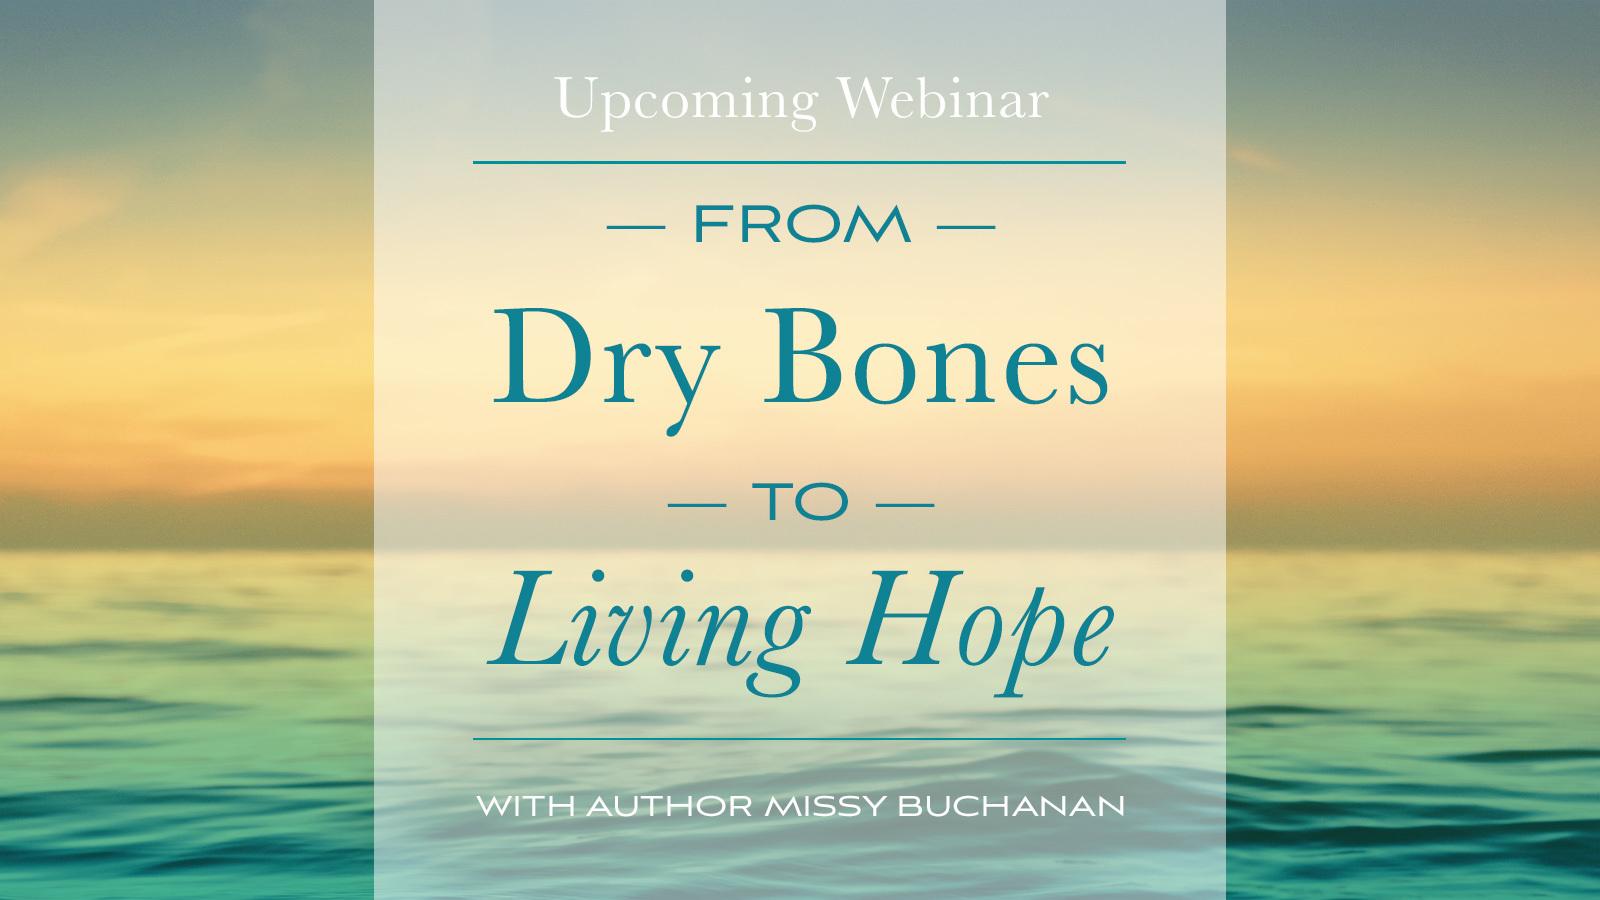 Dry bones living hope